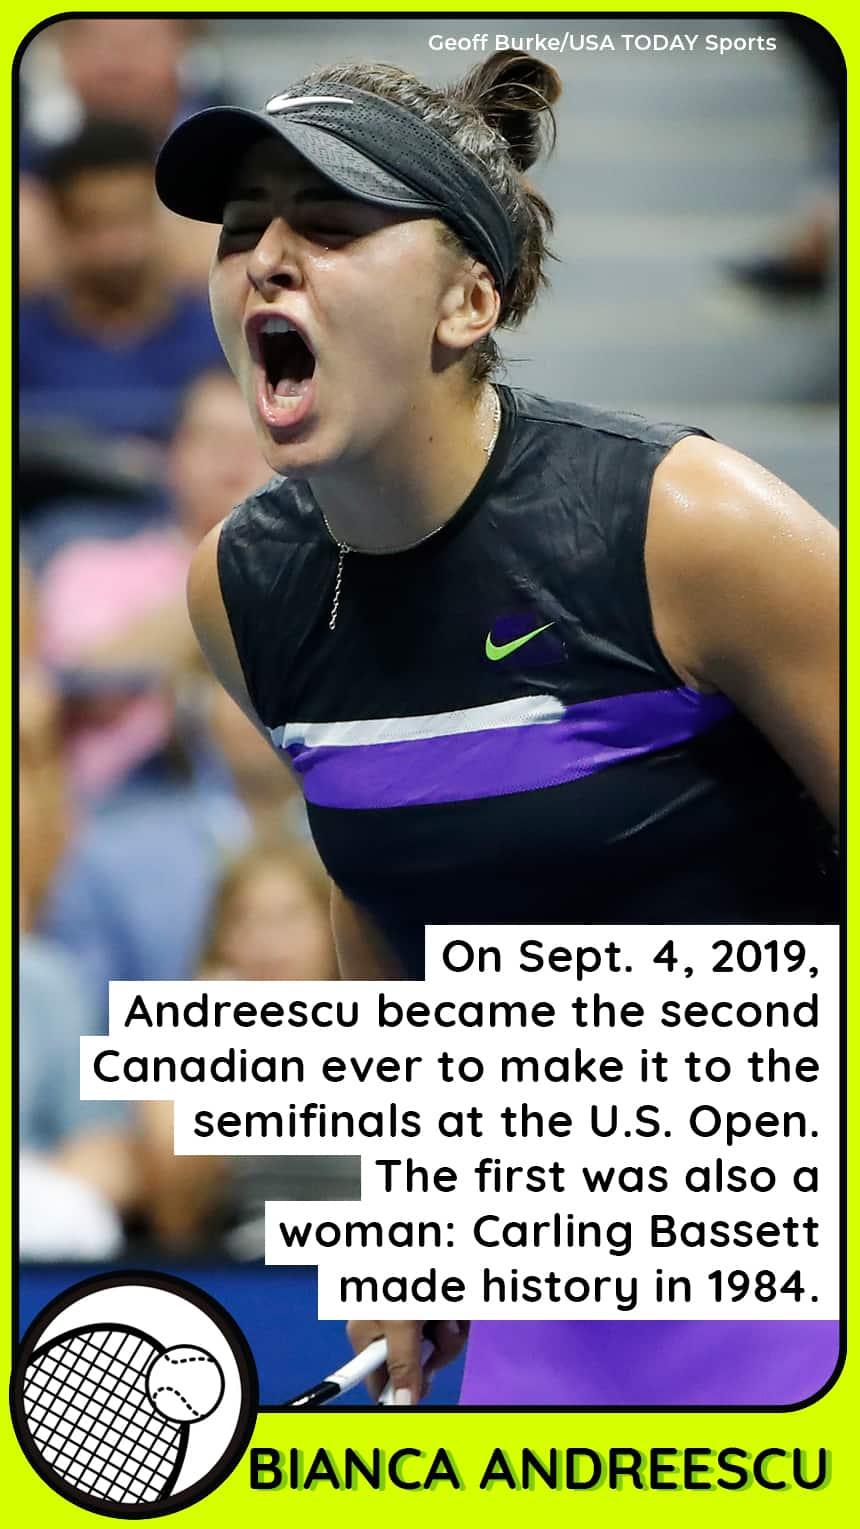 A woman screams holding a tennis racket..